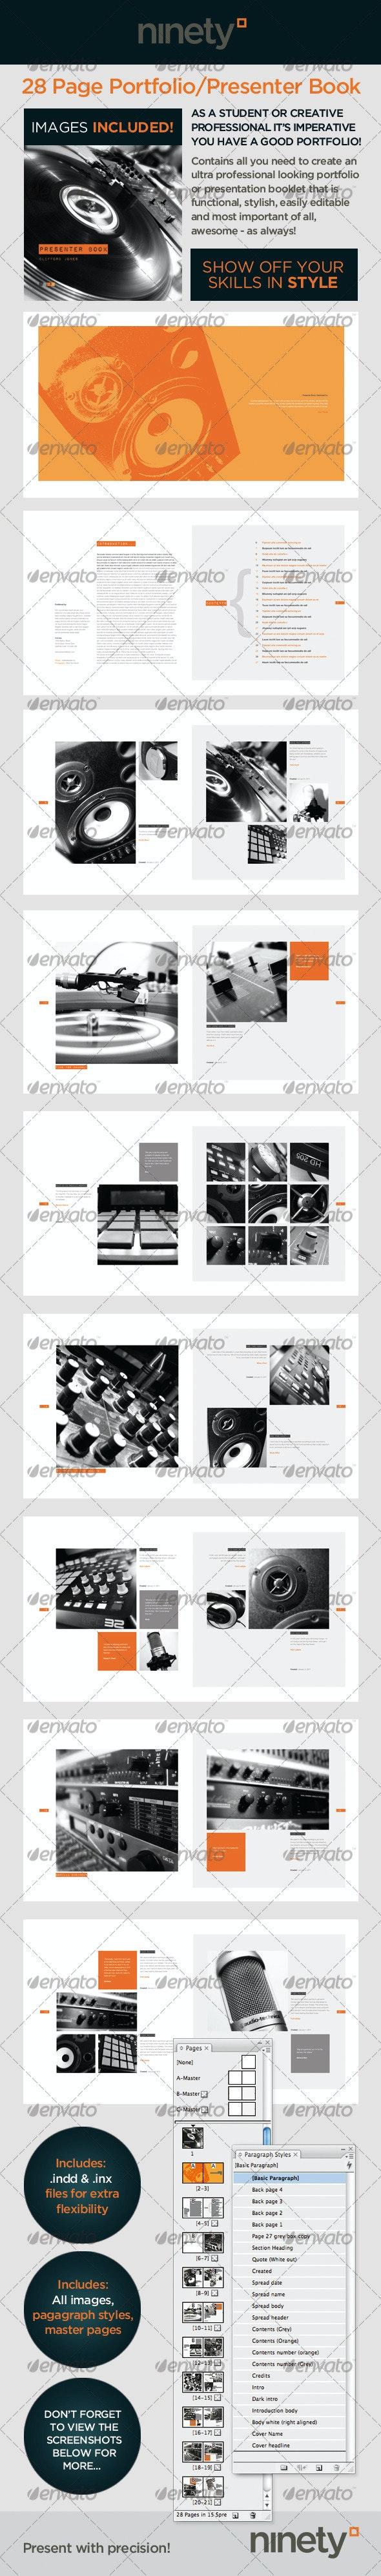 Portfolio Book/Presenter - Portfolio Brochures